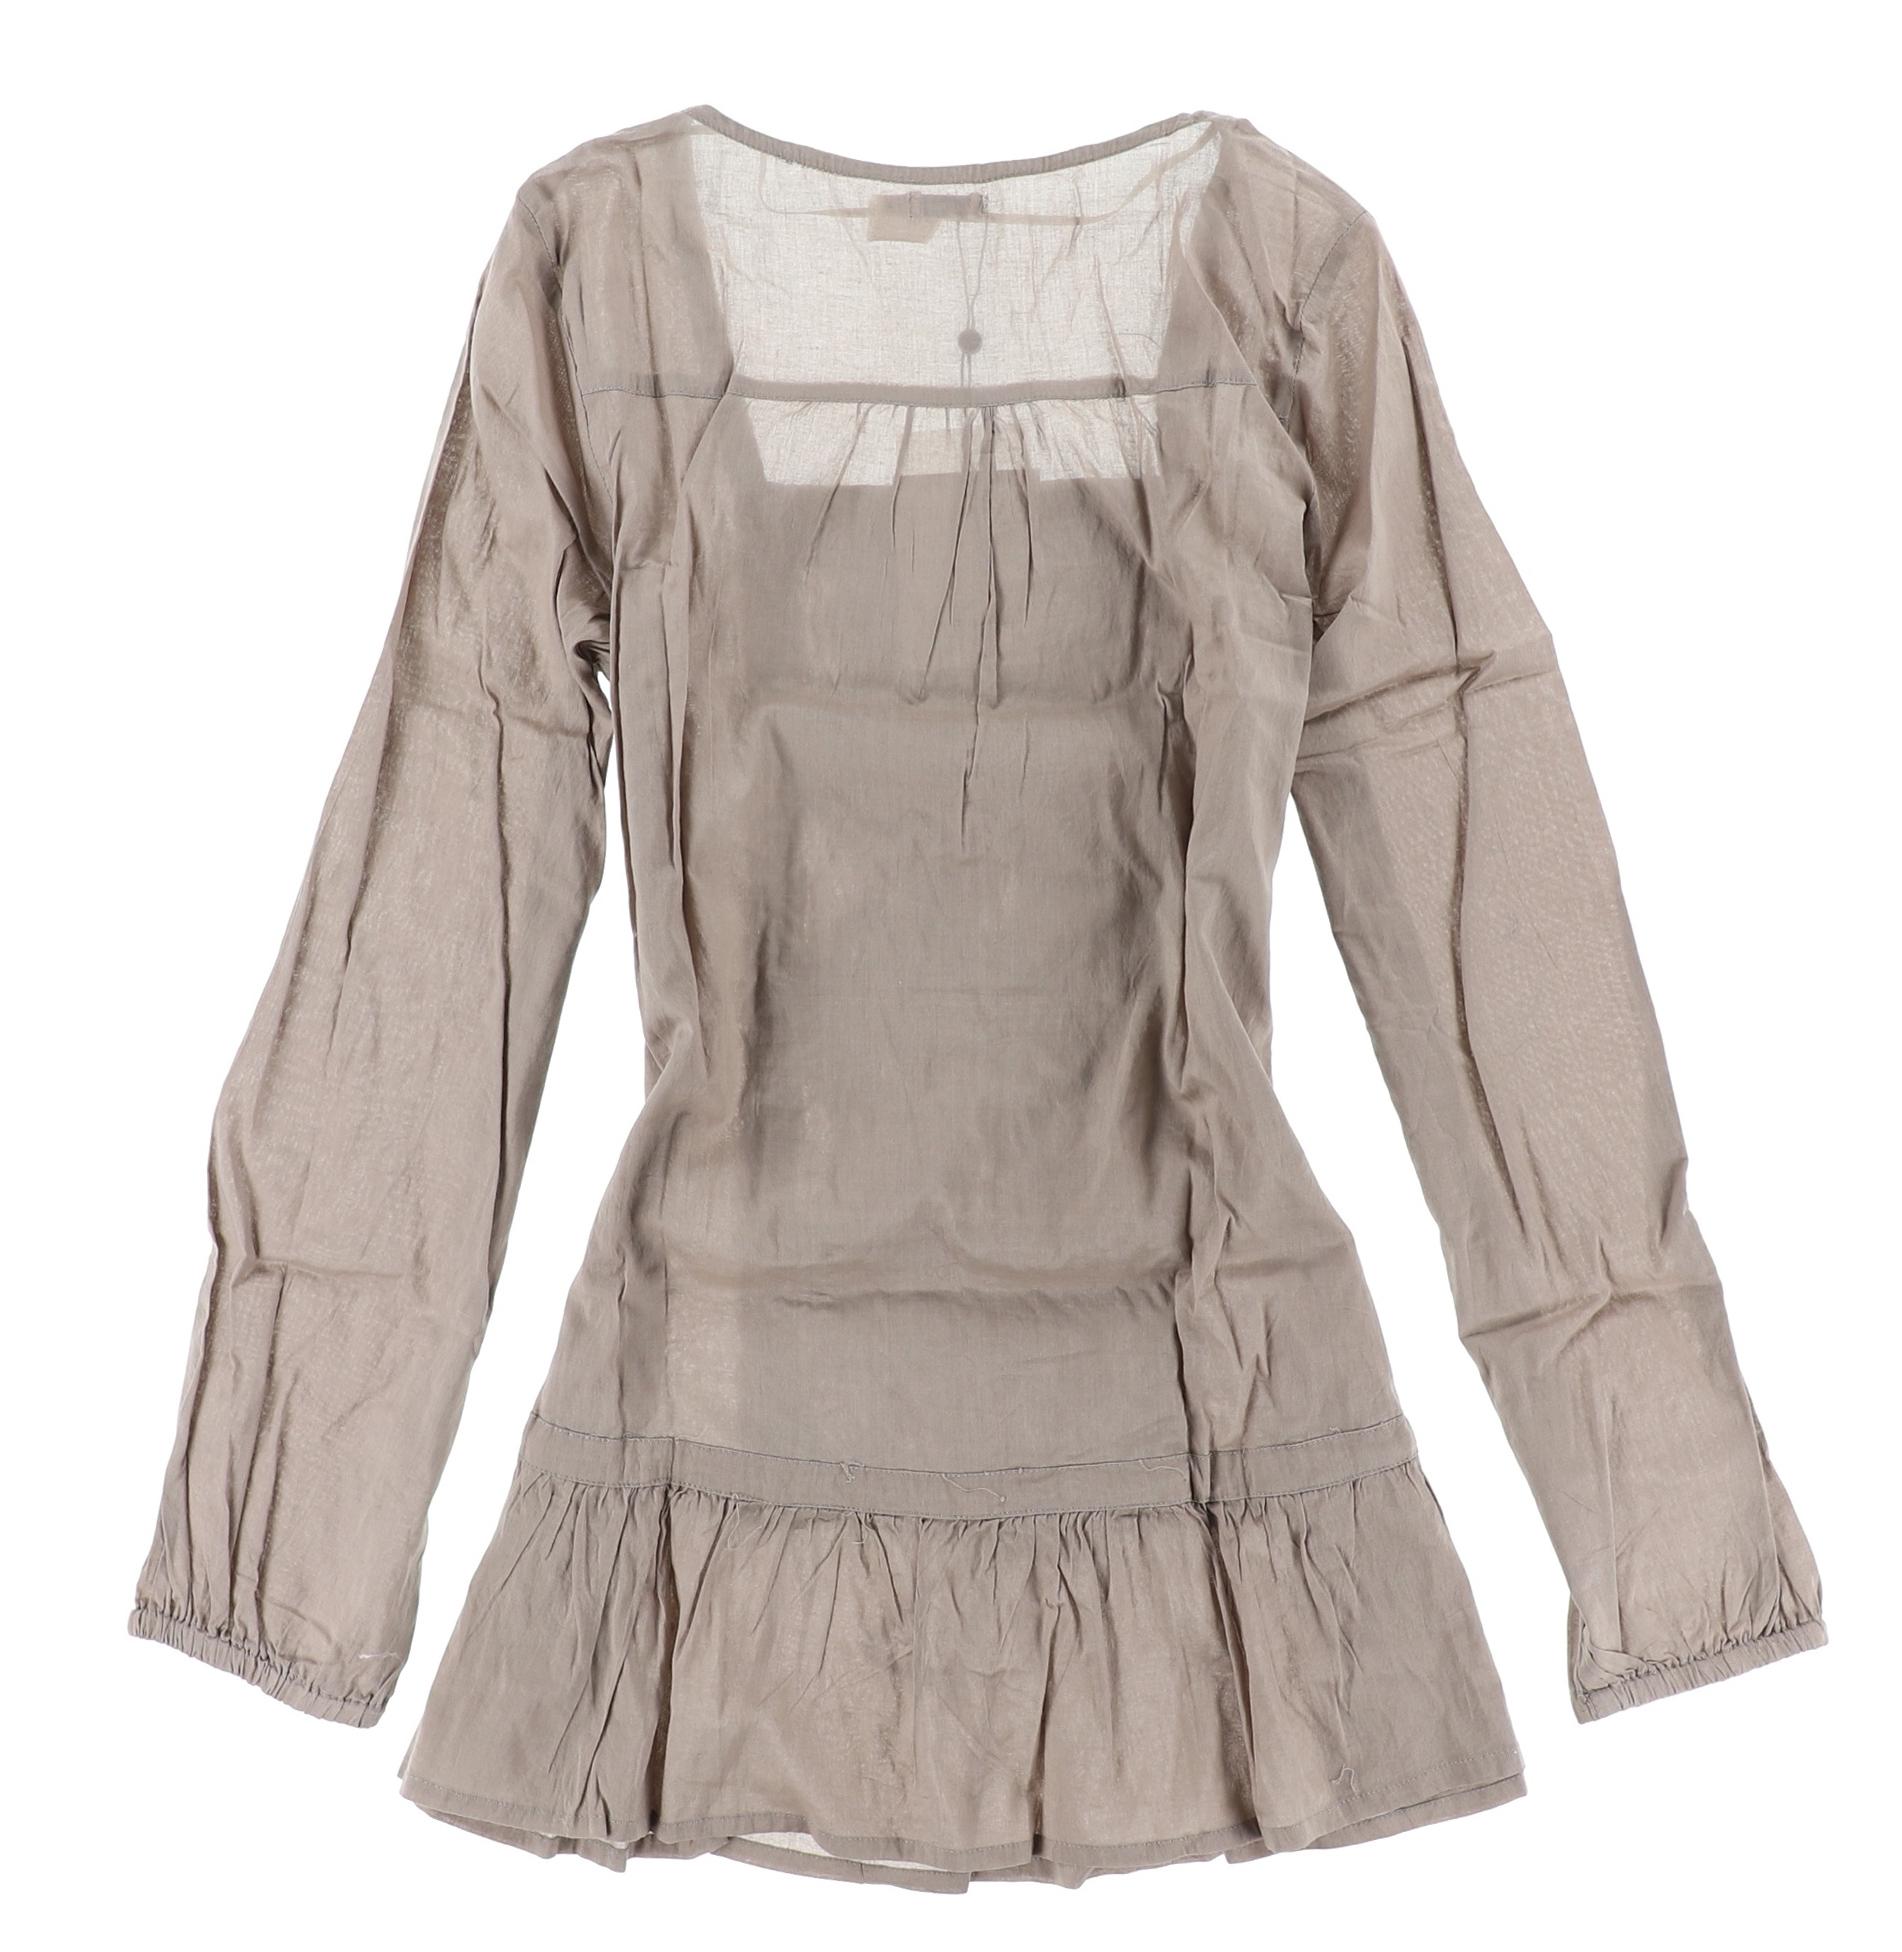 Kaffe Damen Tunika Kleid Dress Boho Gr.34 Braun Khaki, 181 ...